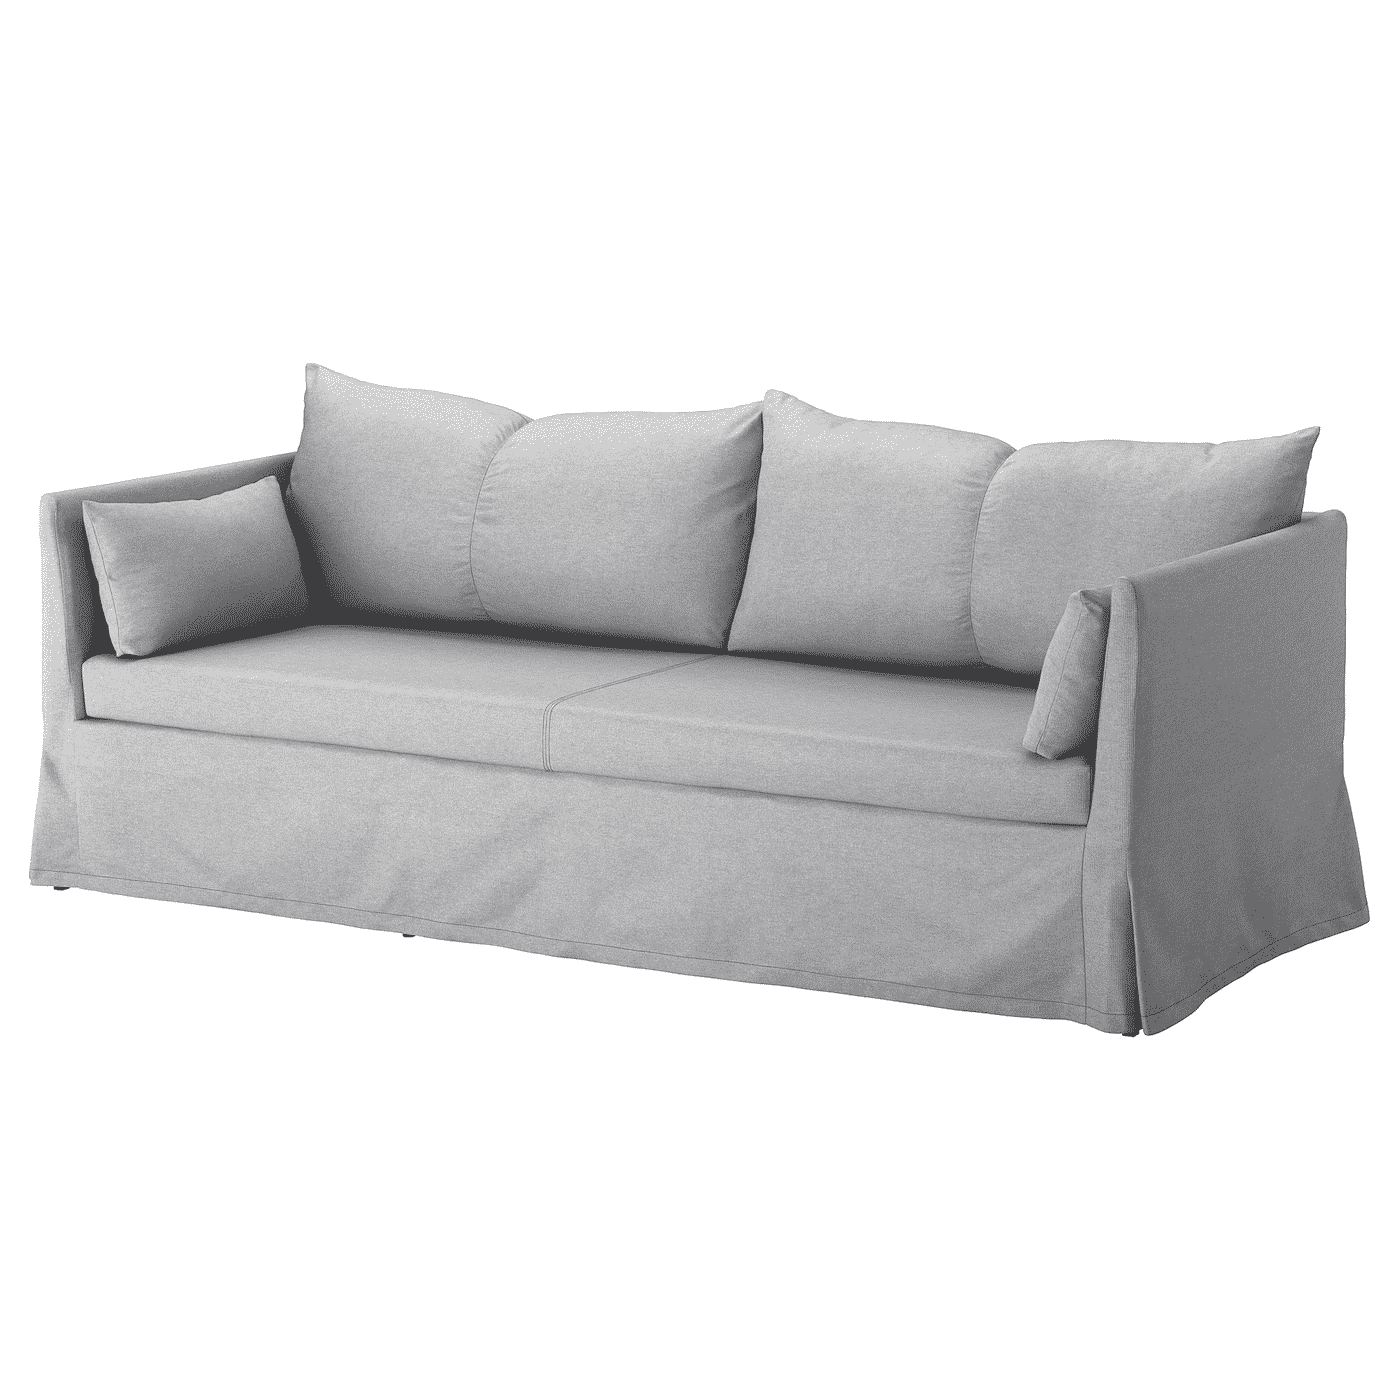 SANDBACKEN Sofa